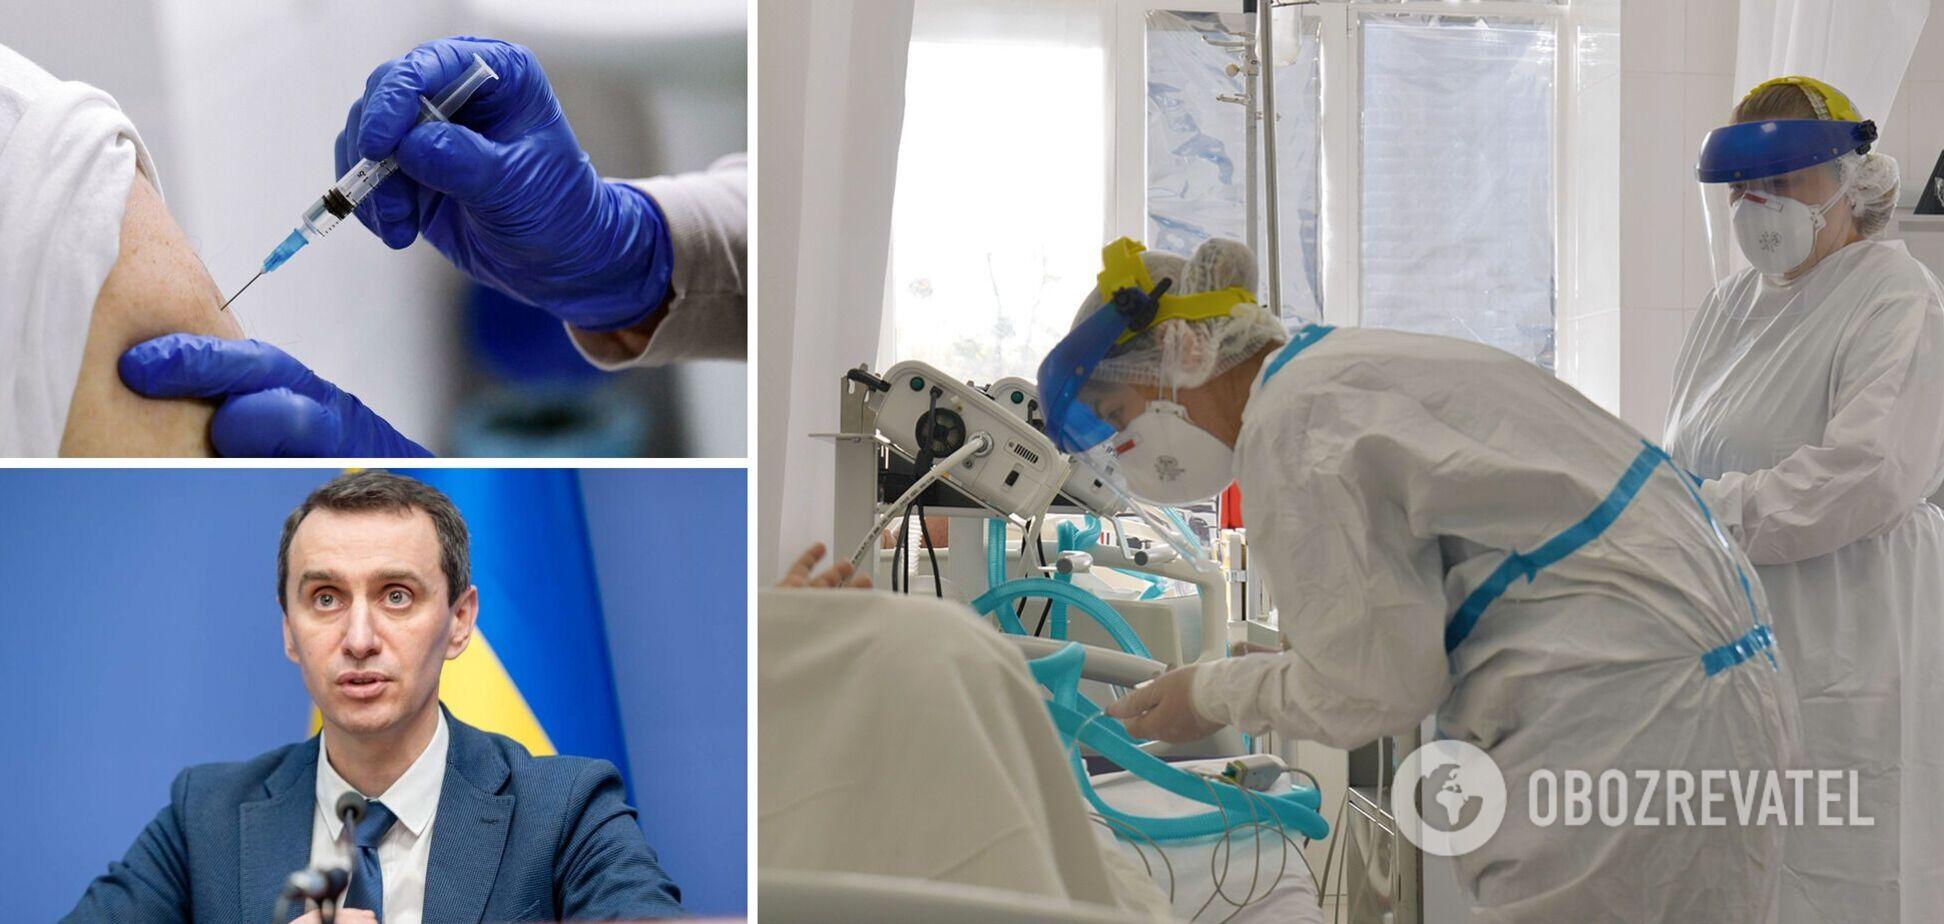 Врачи пояснили, как Минздрав провалил вакцинацию от коронавируса